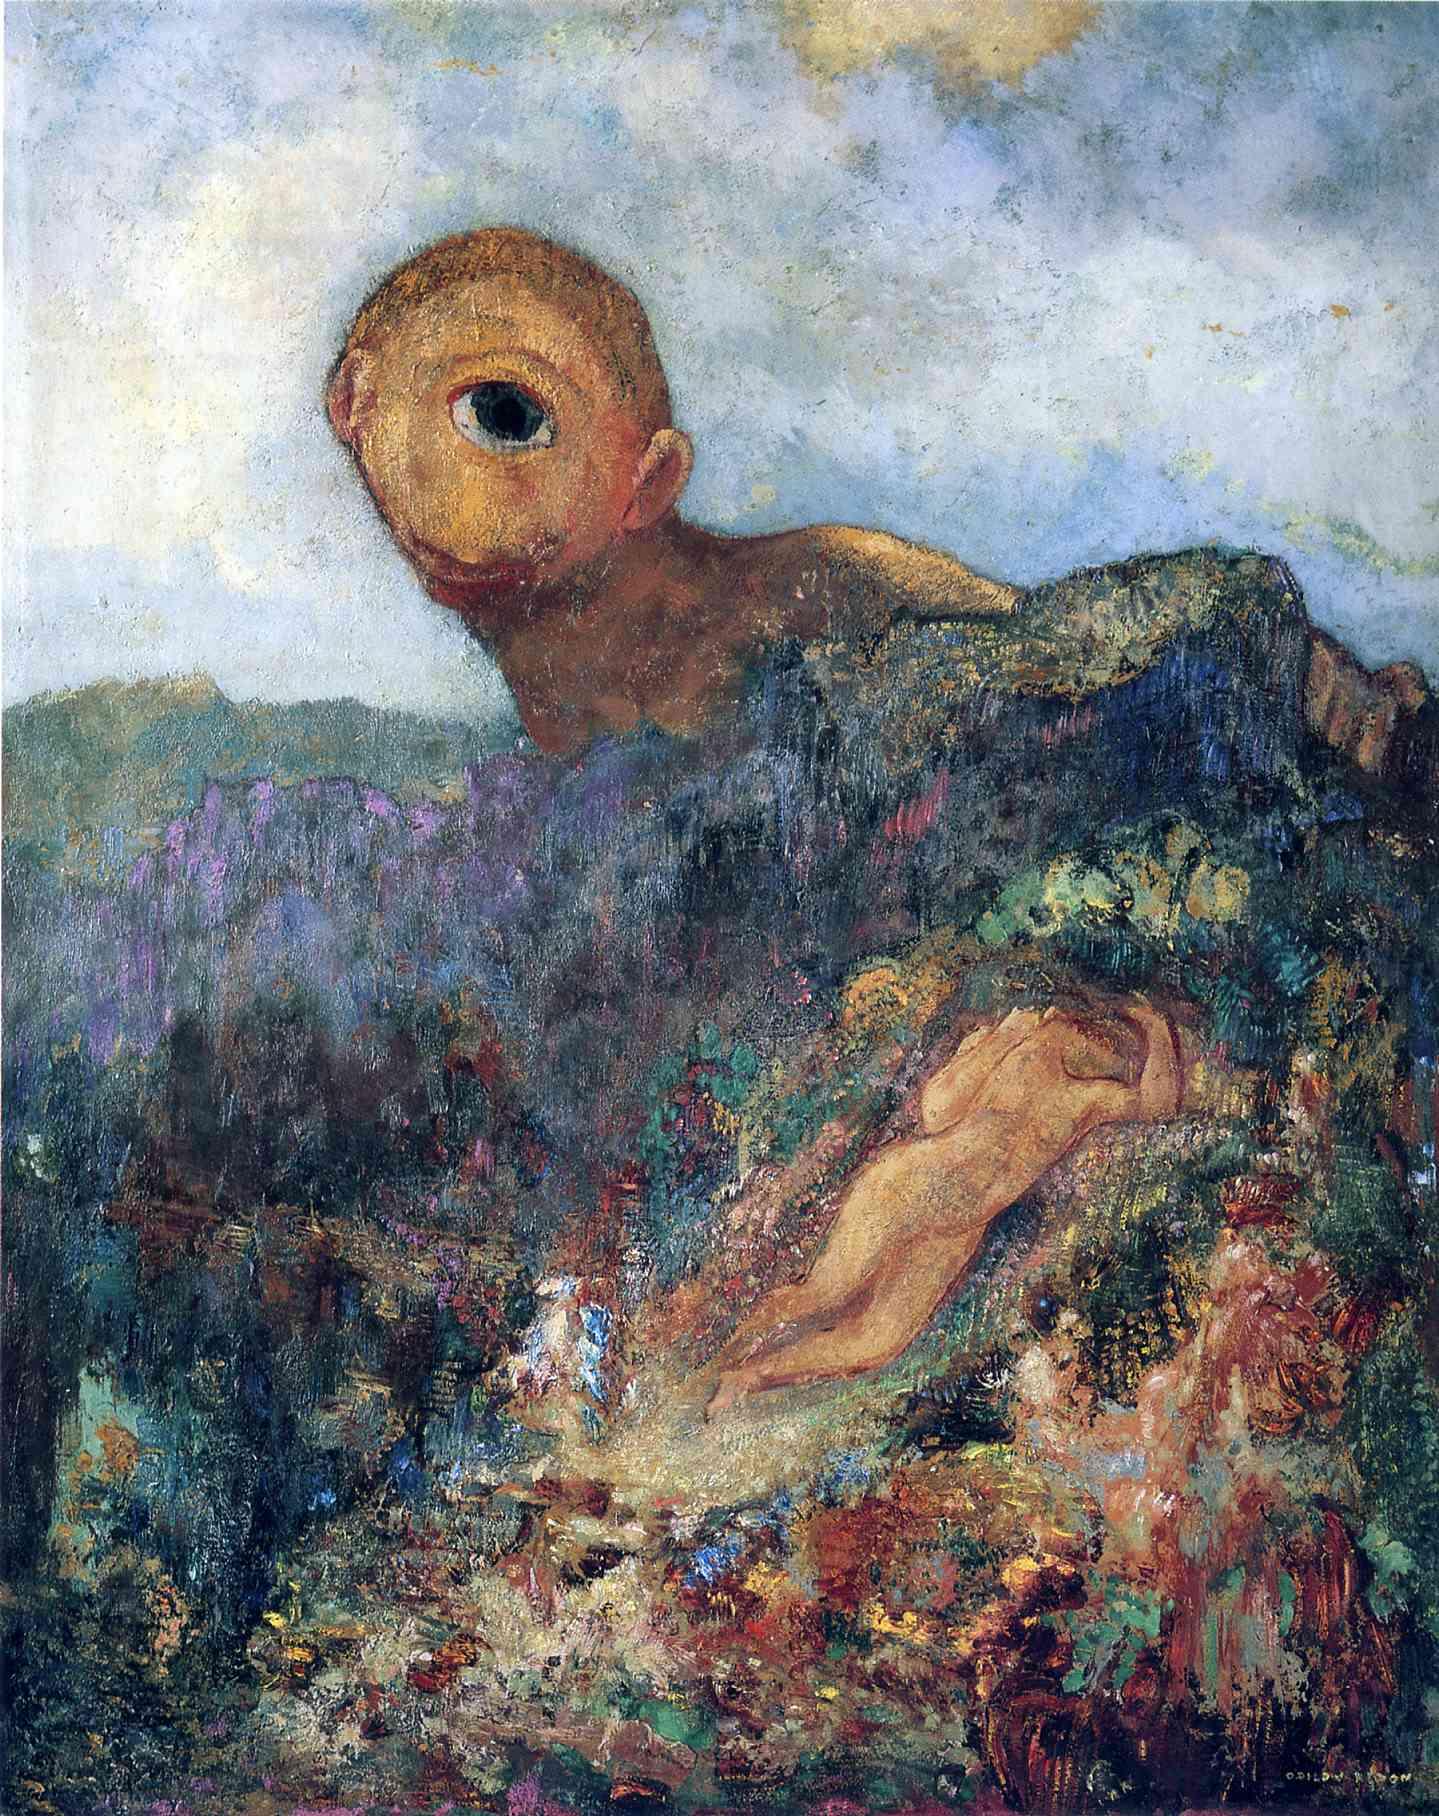 The Cyclops, c.1914 - Odilon Redon - WikiArt.org